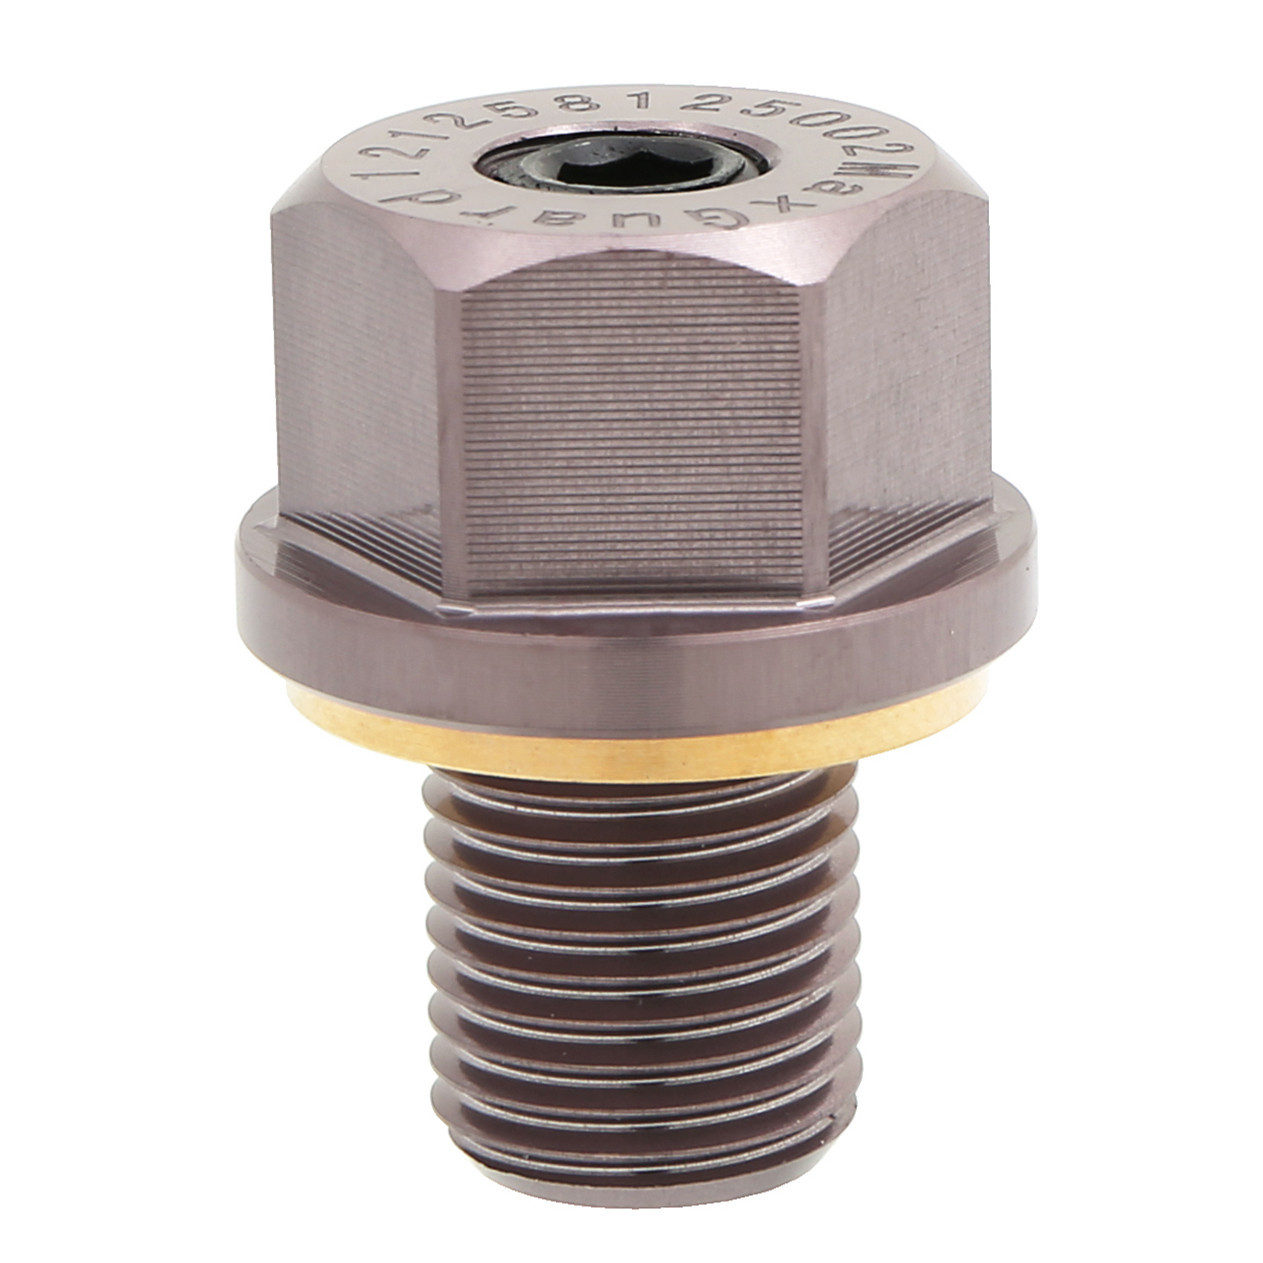 Magnetic Oil Sump Drain Plug Skyline M12x1.25 PURPLE GTR Stagea